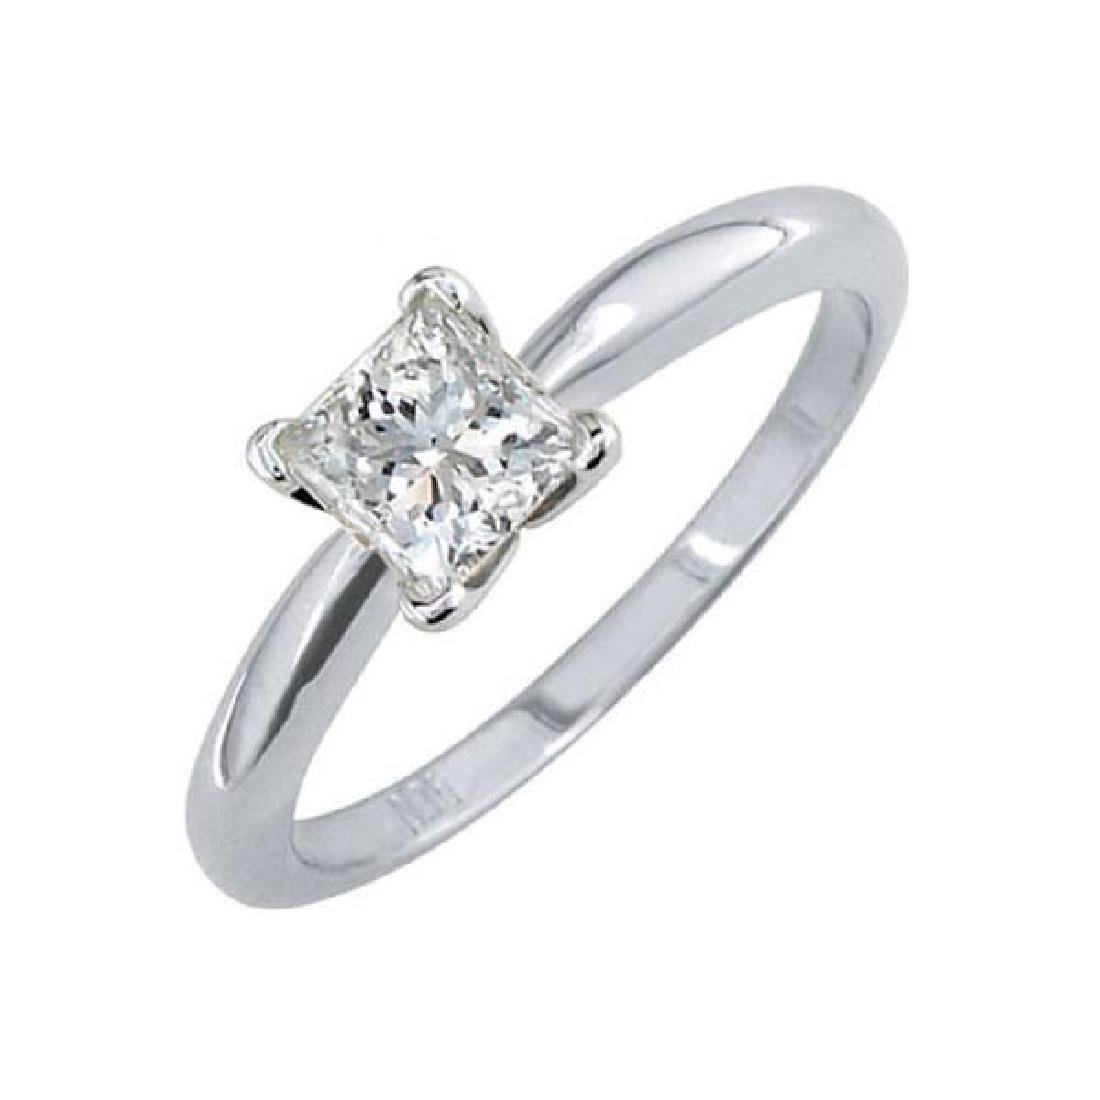 Certified 0.69 CTW Princess Diamond Solitaire 14k Ring